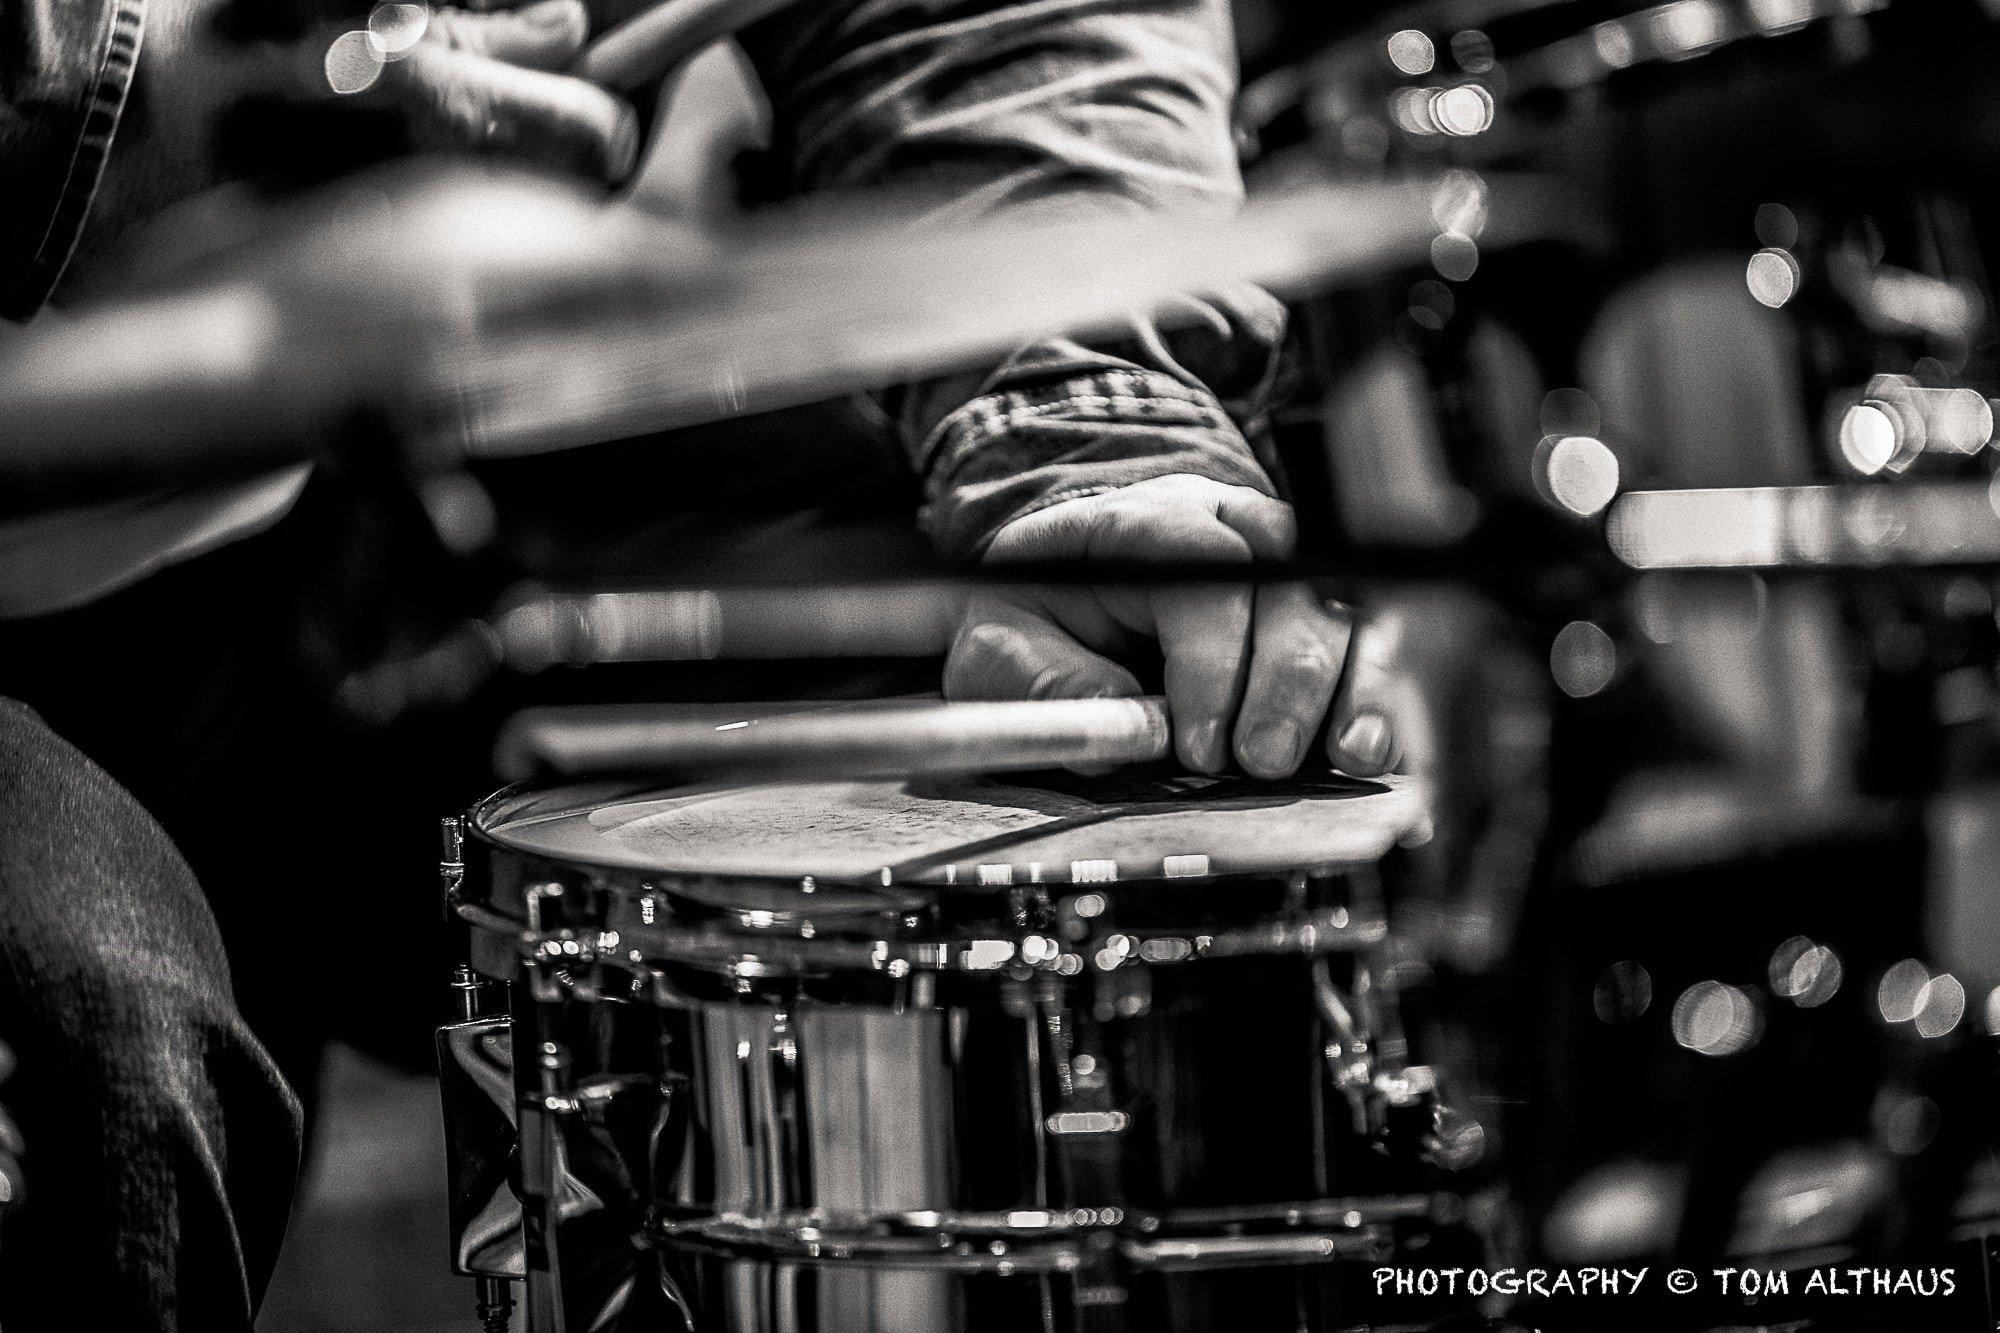 Photography © Tom Althaus